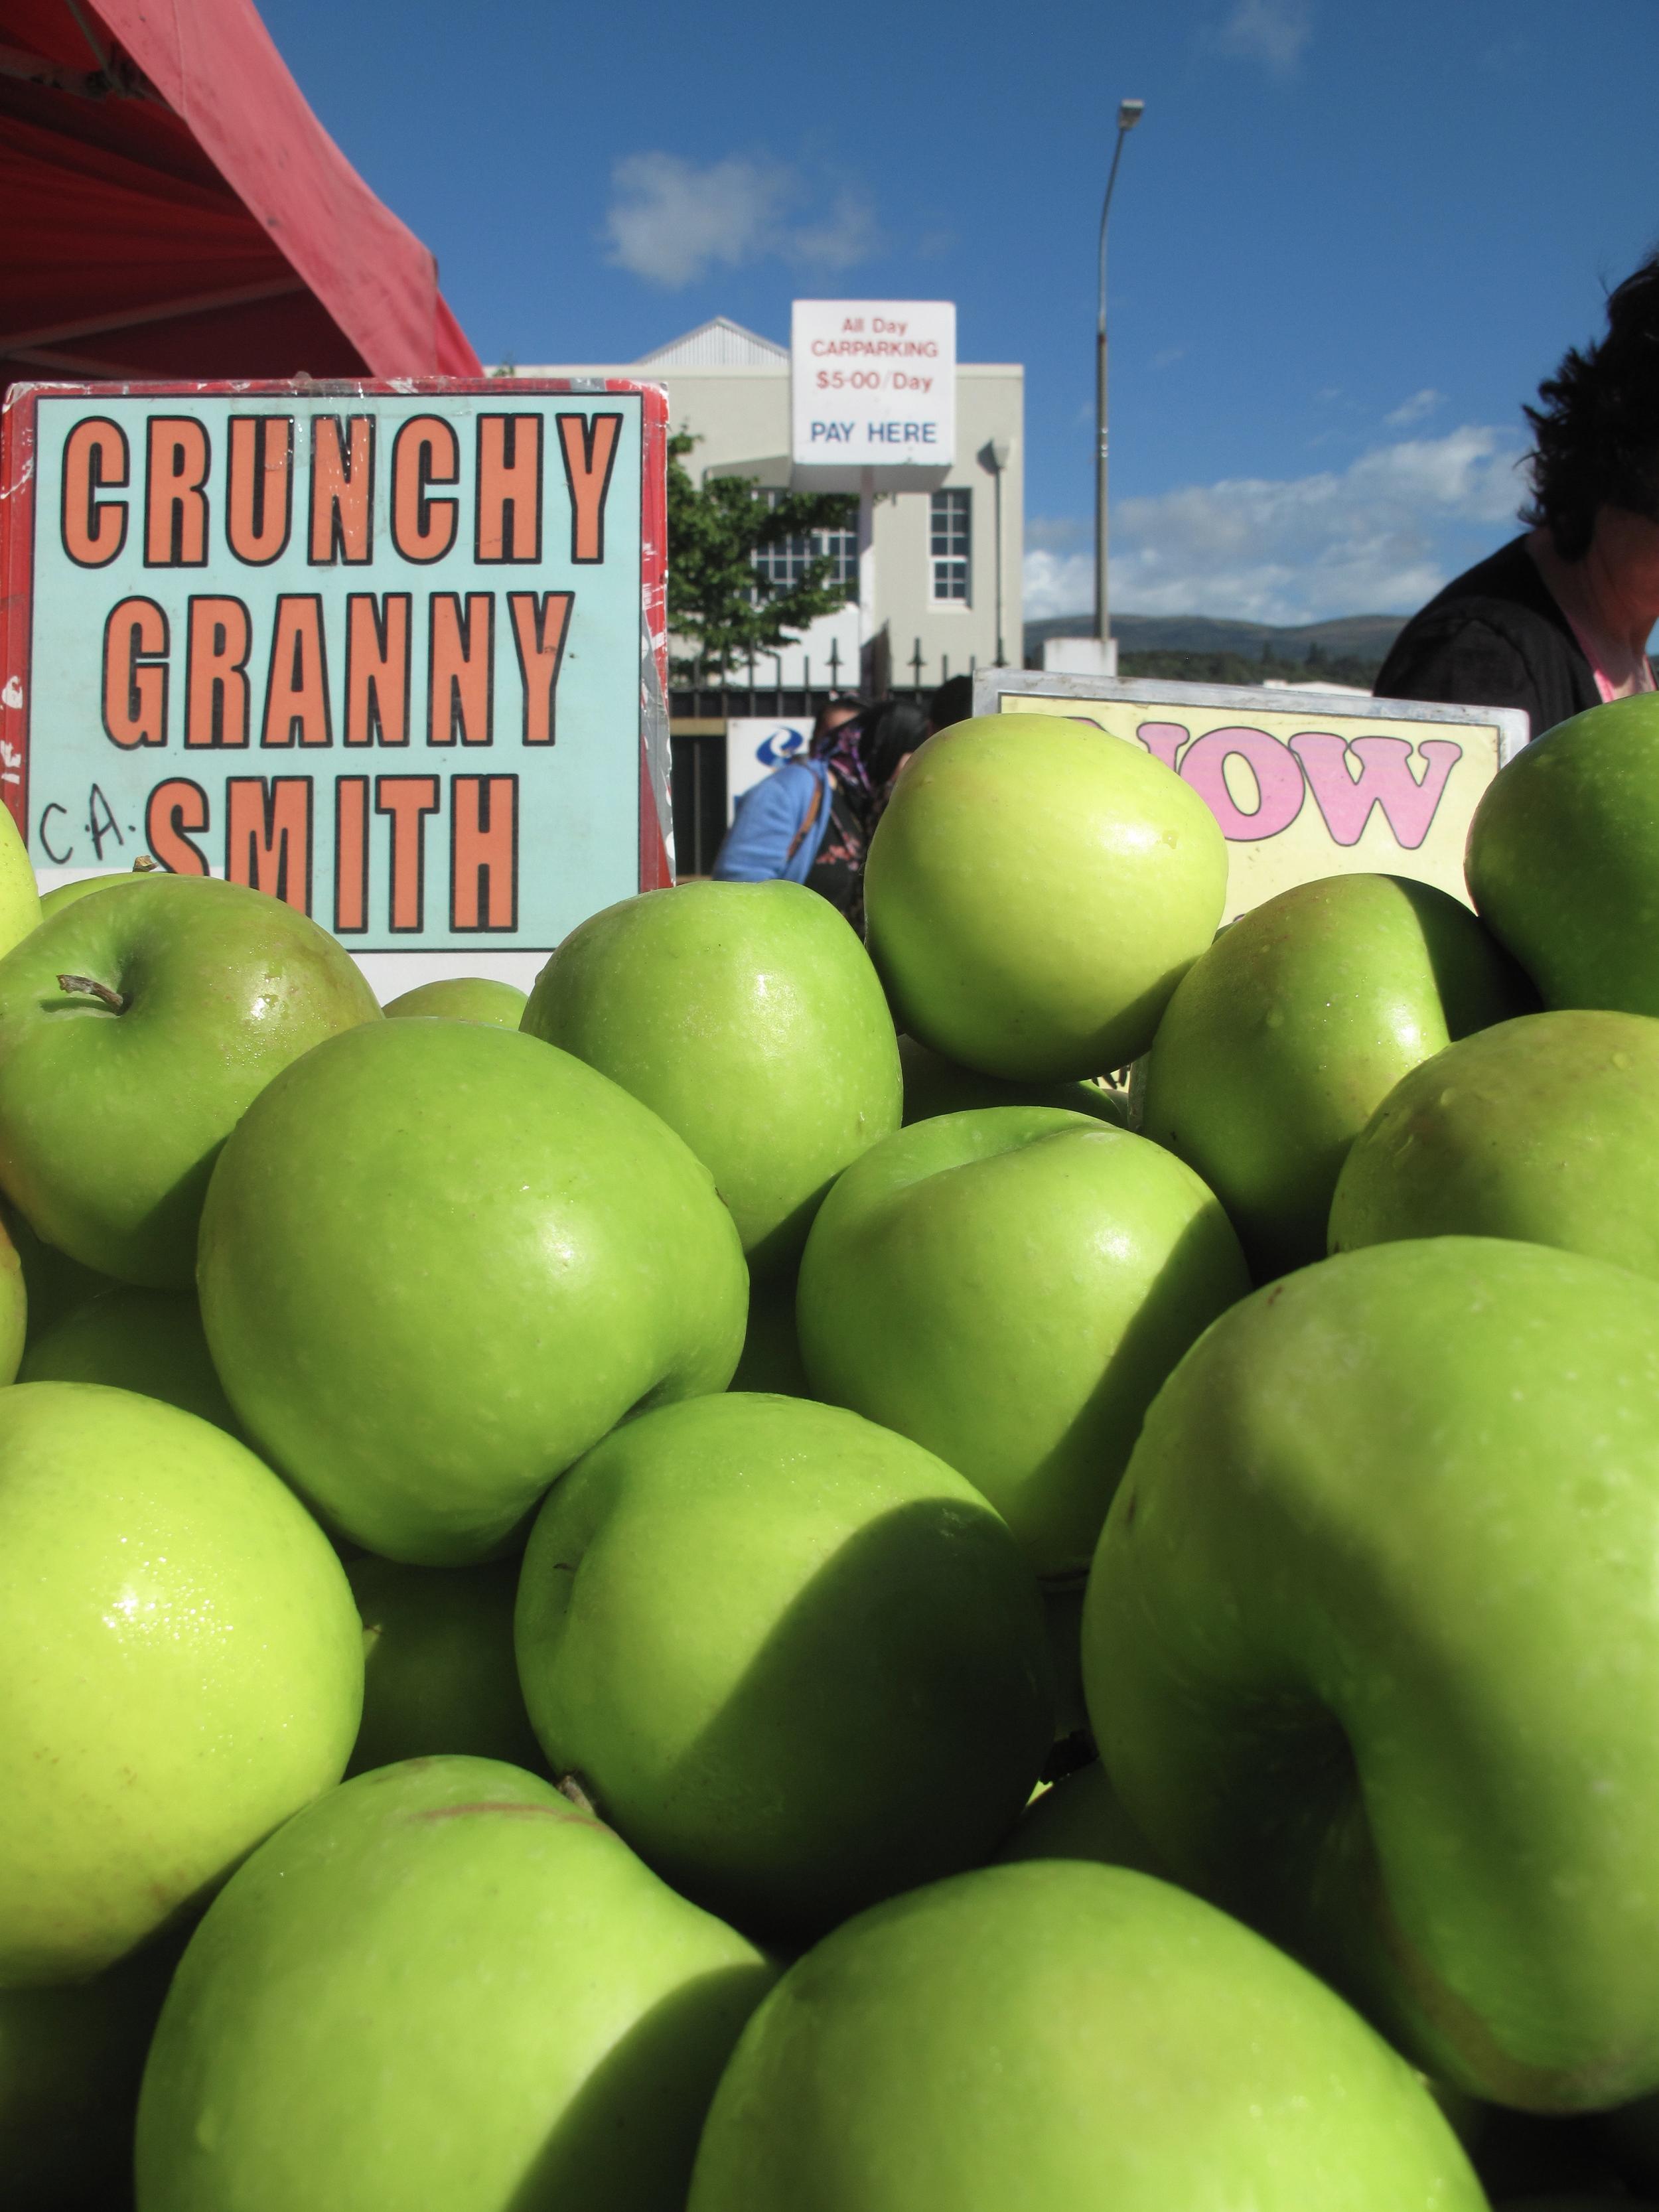 Granny Smith apples at farmer's market NZ